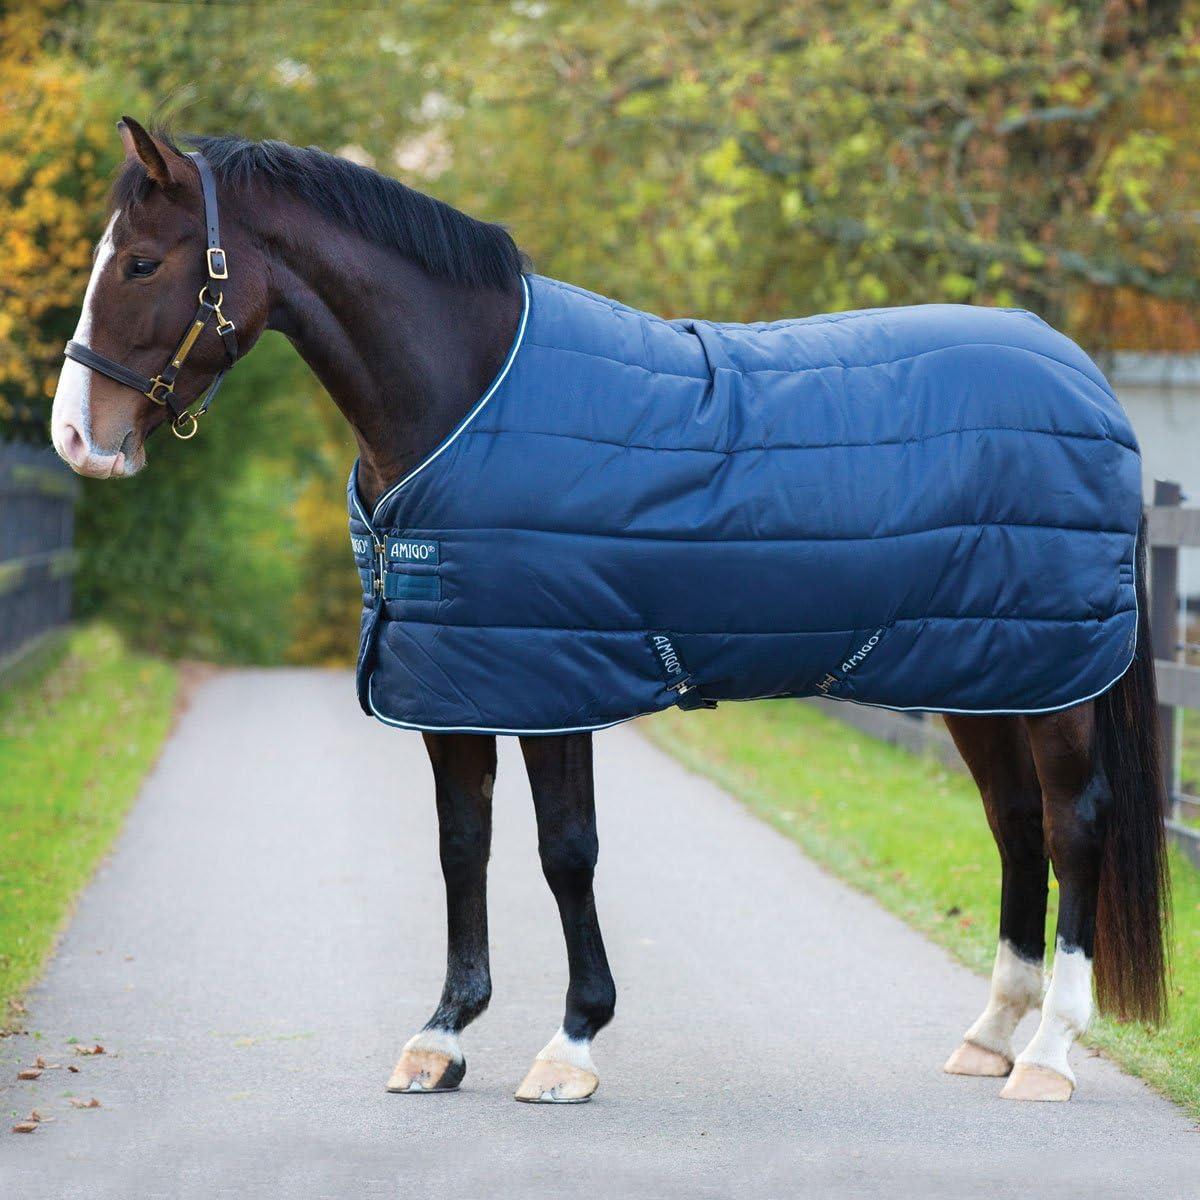 Horseware Amigo XL Insulator Stable Blanket Medium 200g Ripstop